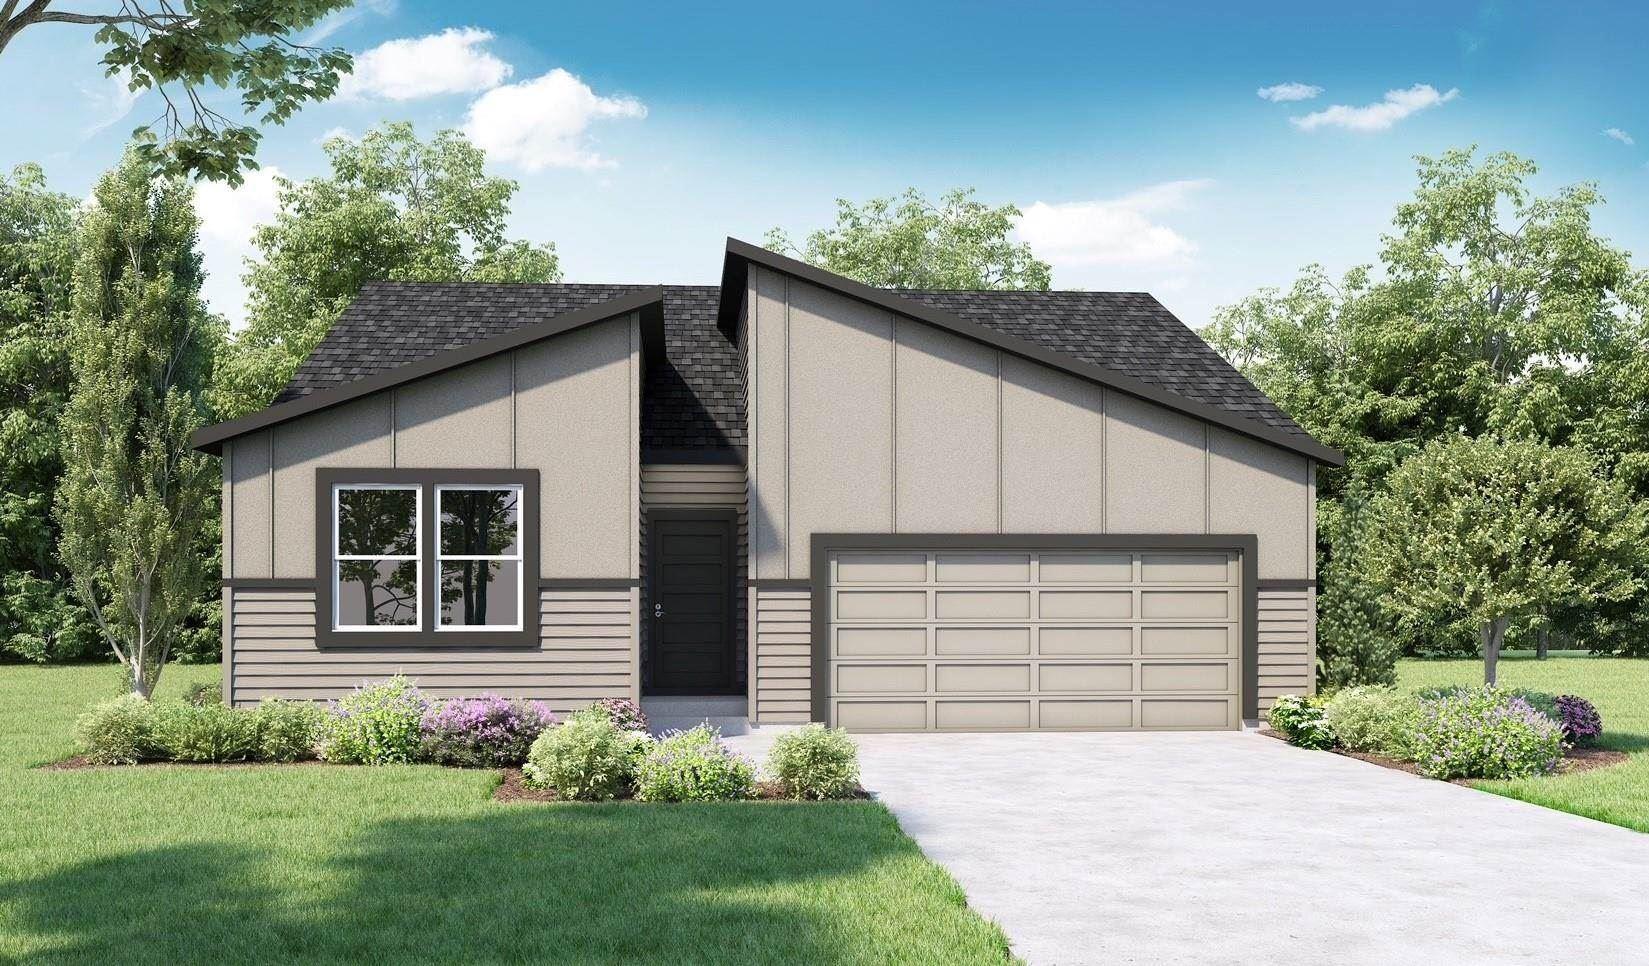 3226 N Stanley St, Spokane, WA 99217 - #: 202118649